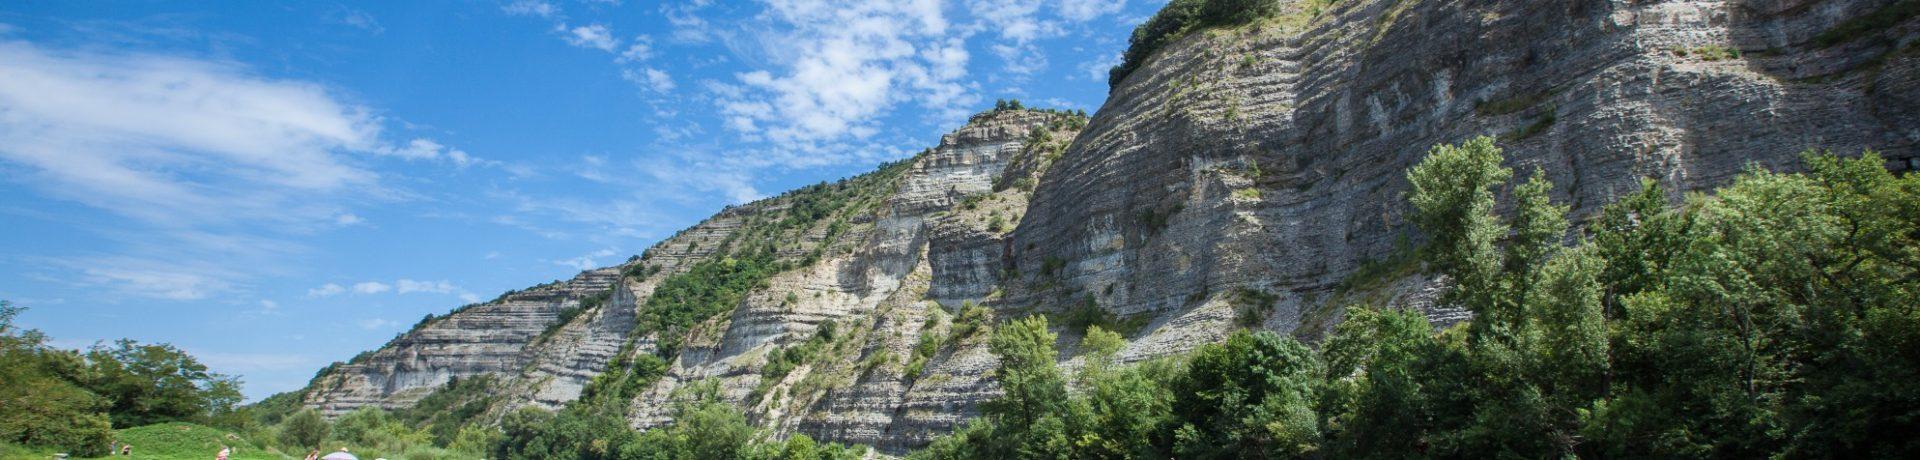 Camping La Grand'Terre in Ruoms is een prachtige familiecamping gelegen in de Ardèche in Rhône-Alpes.